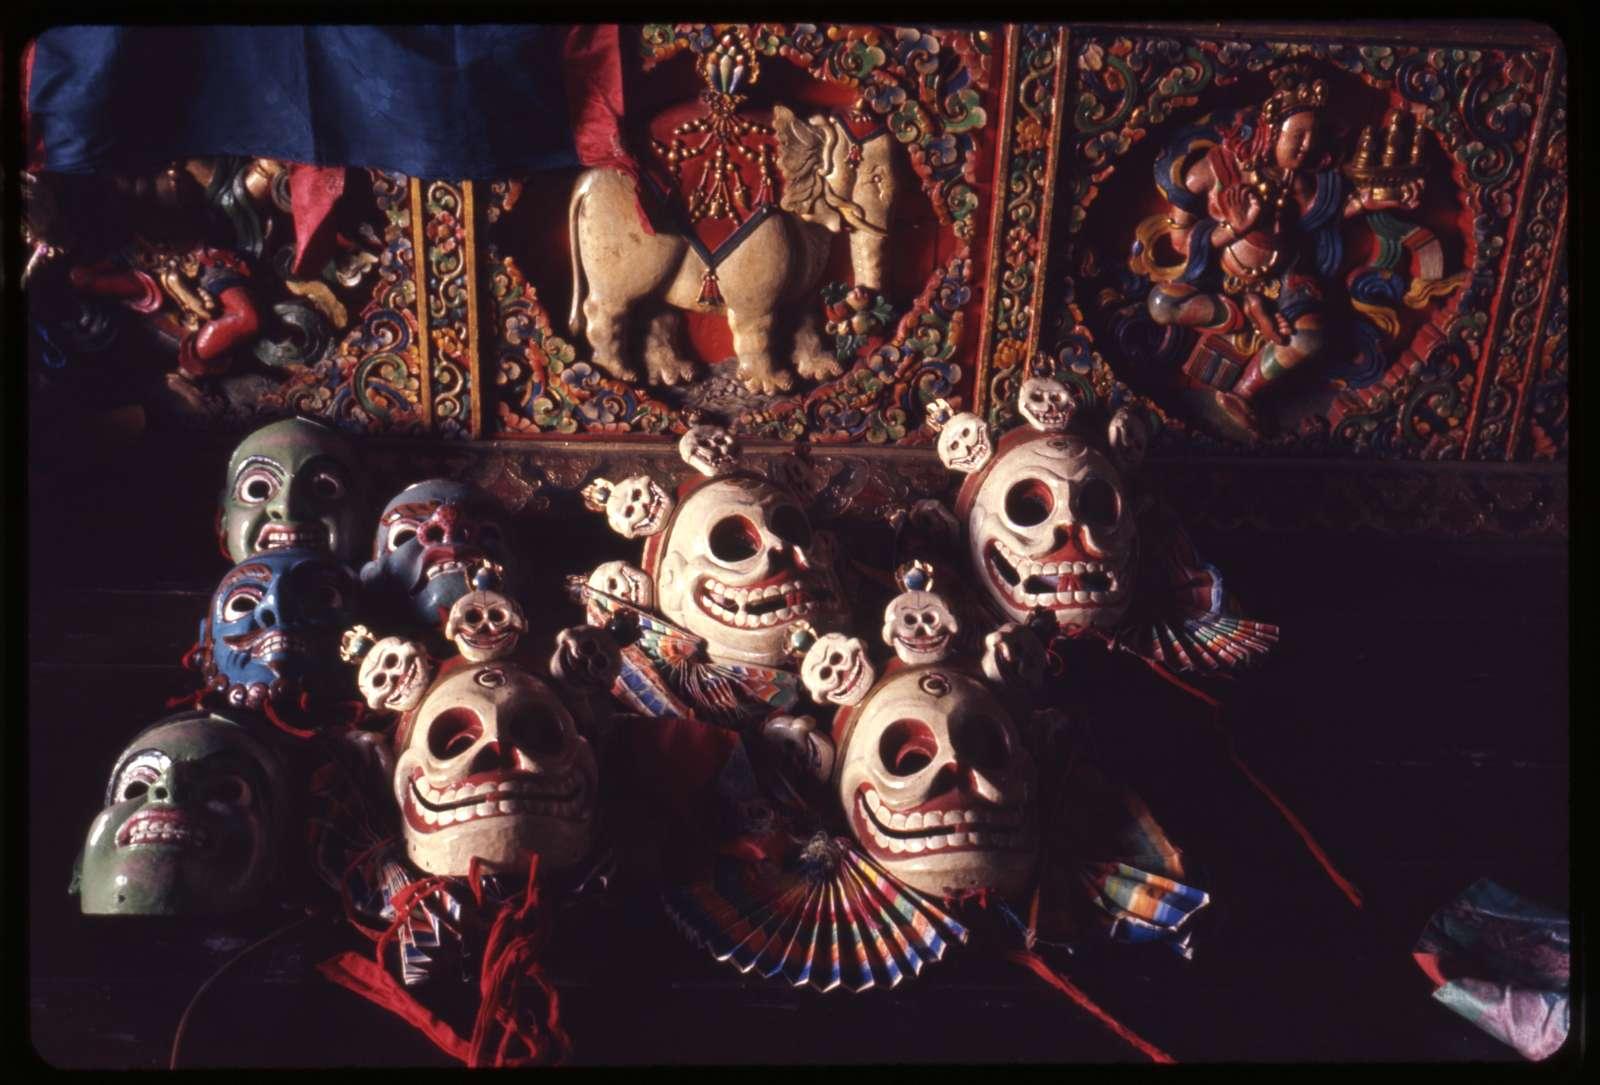 [Deity and skeleton masks, Gangtok, Sikkim]